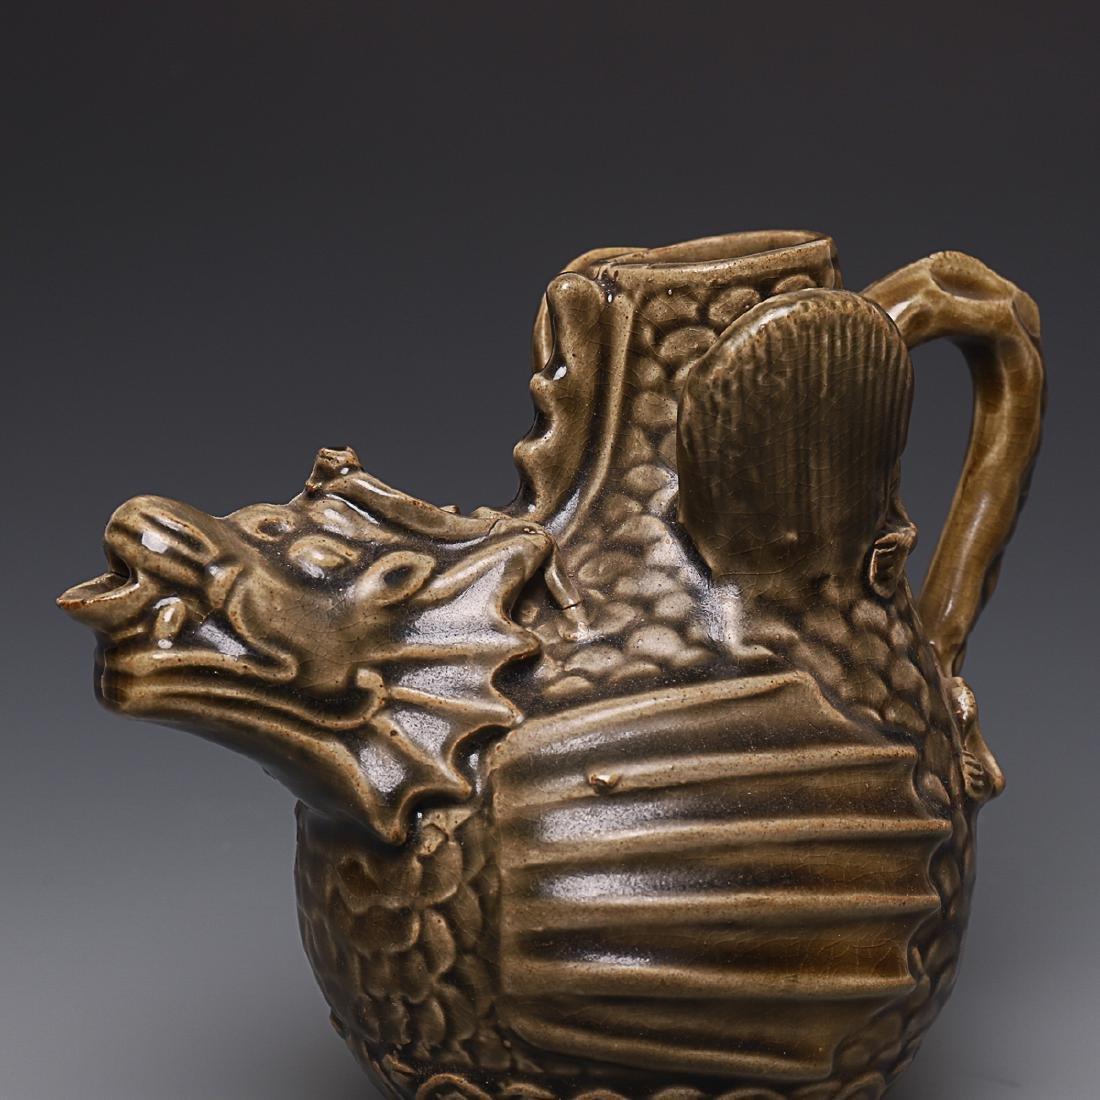 Vintage Chinese Porcelain Pot - 7